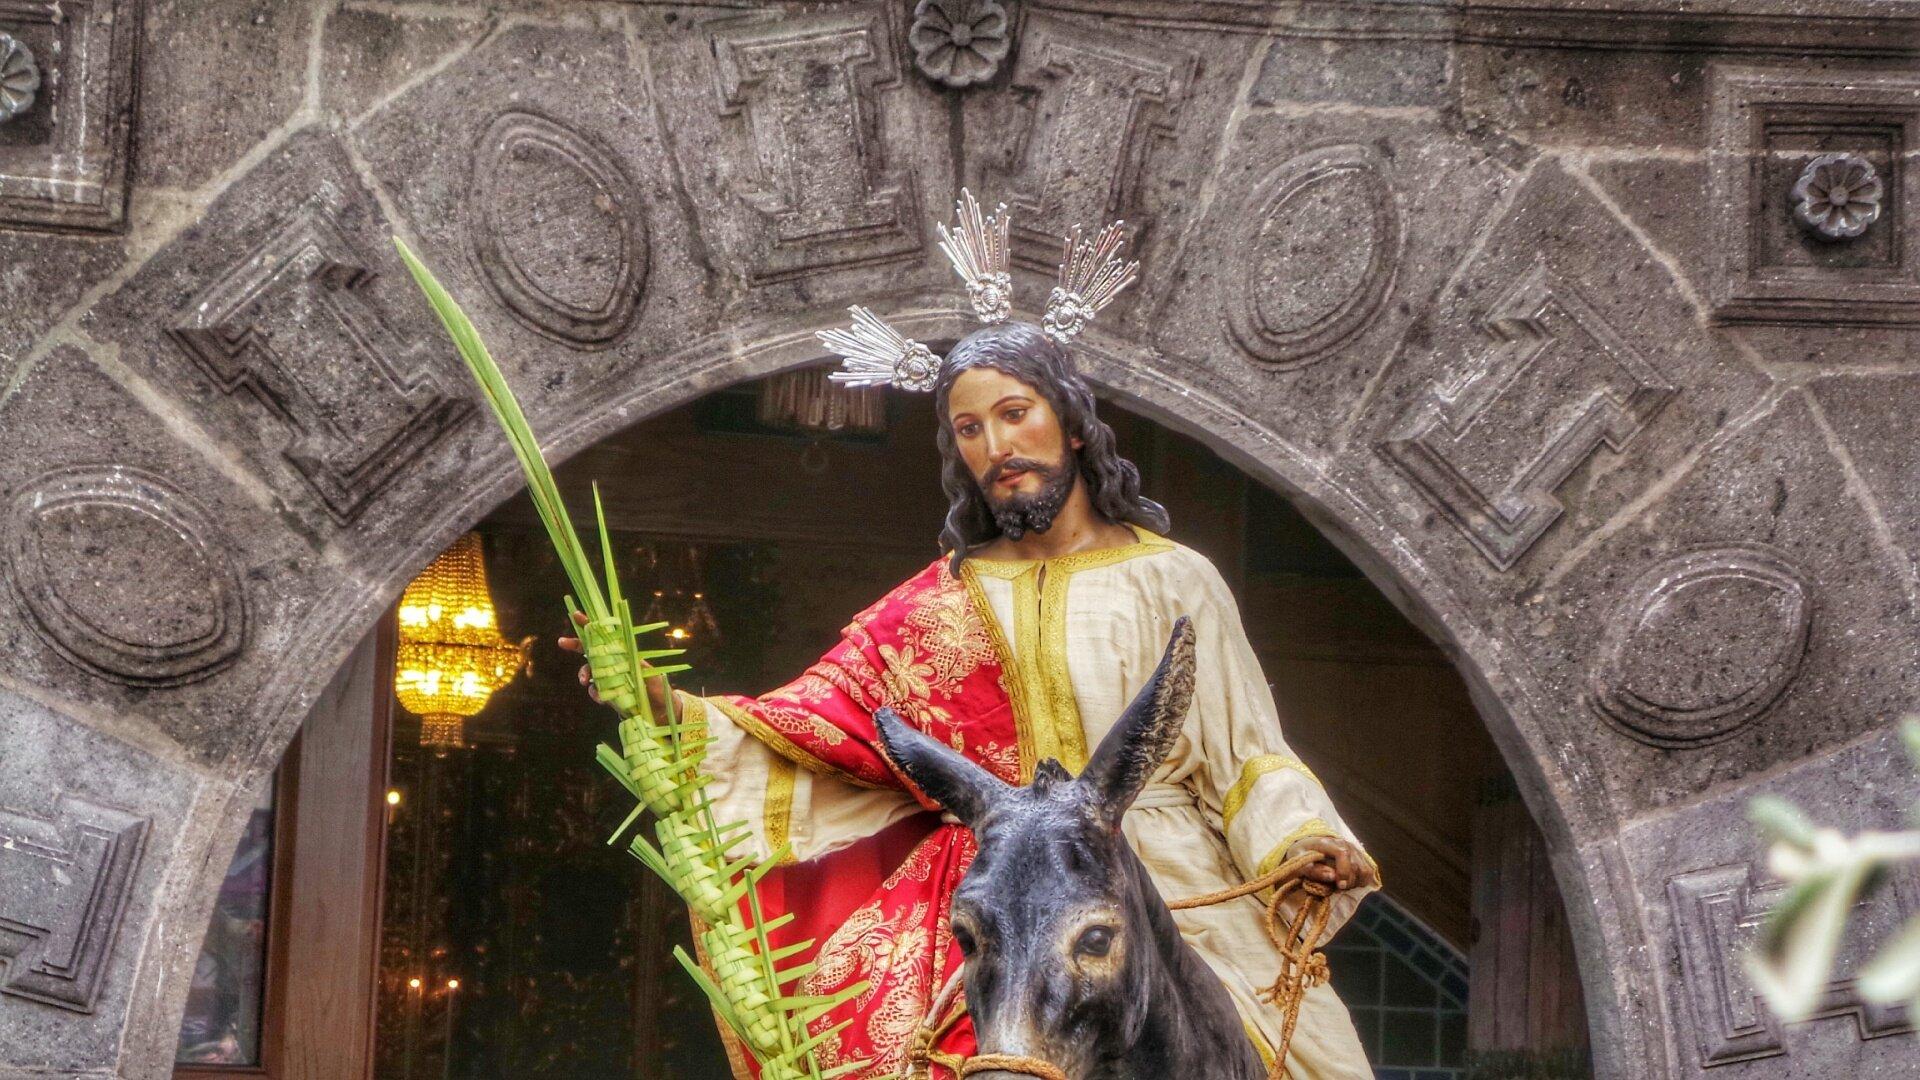 Procession of La Burrita on Palm Sunday in Las Palmas de Gran Canaria 2020